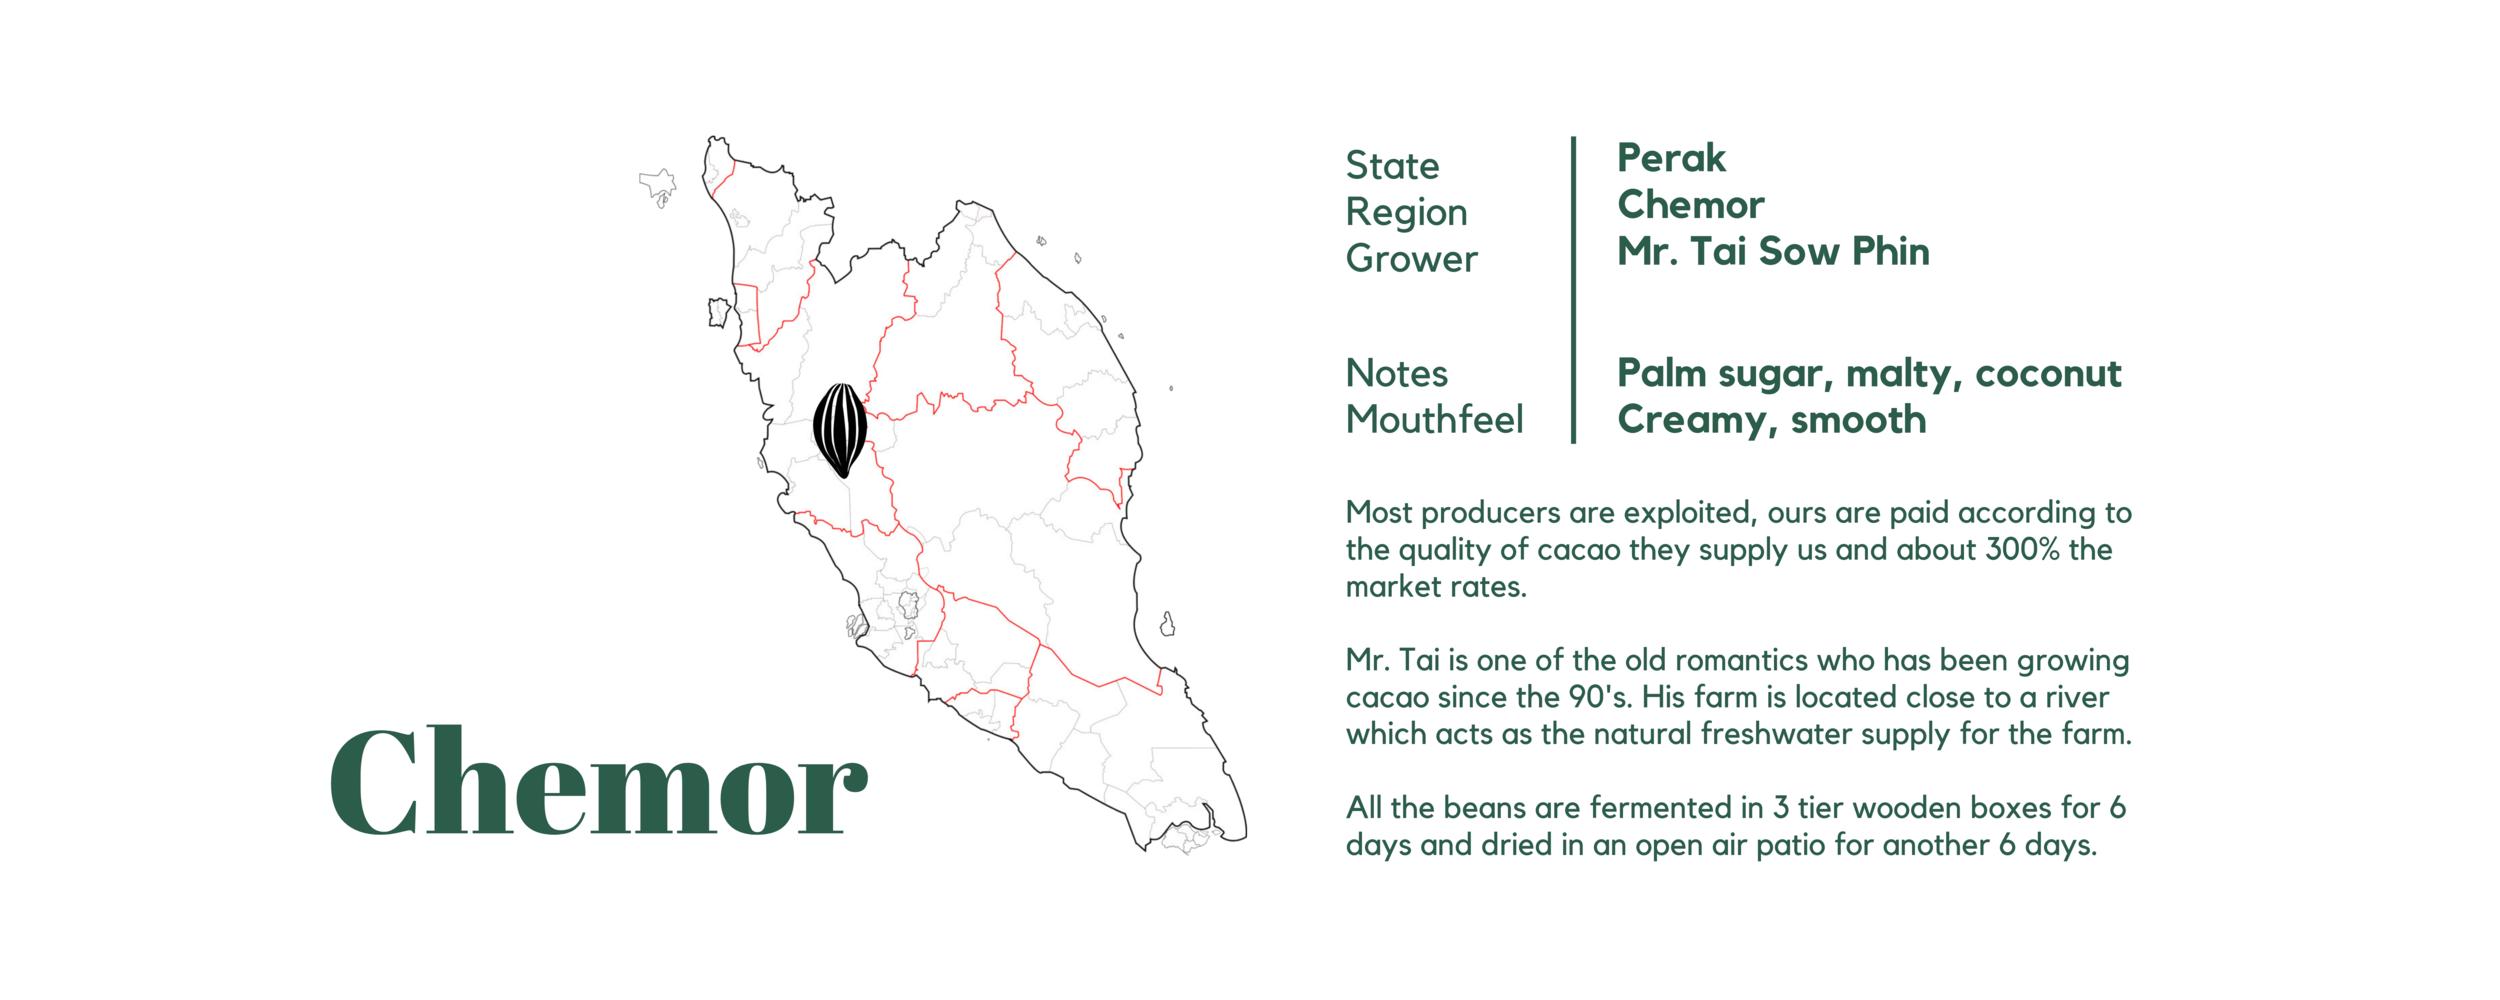 Perak Chemor Mr. Tai Sow Phin.png